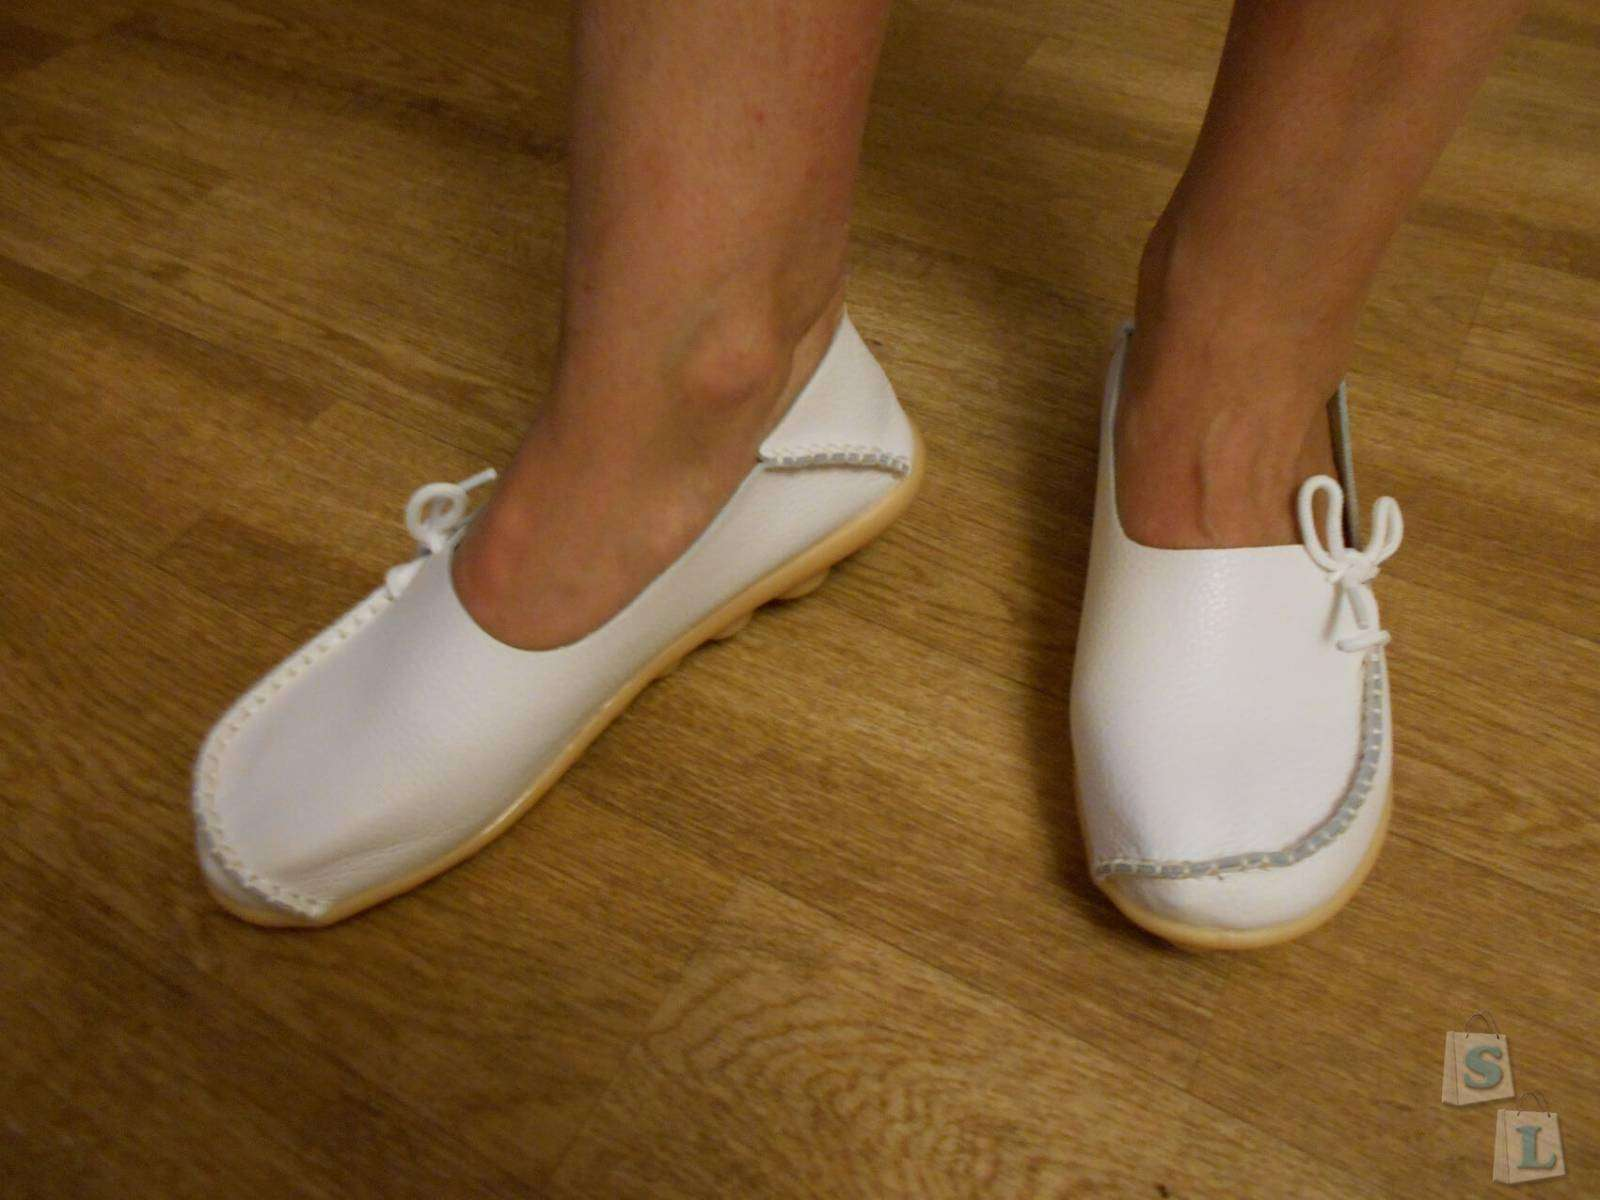 Aliexpress: Тракторетки или балетки с подошвой в стиле ктулху!